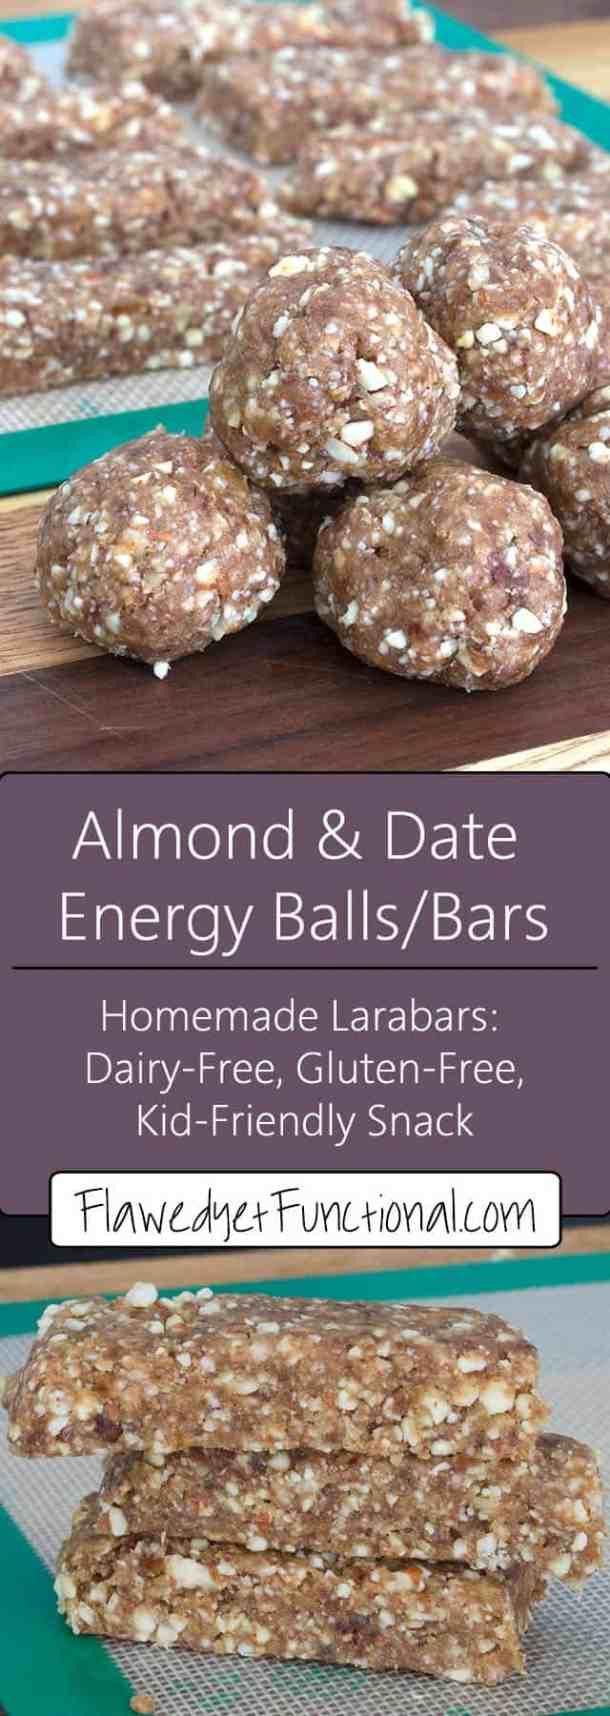 homemade almond larabar